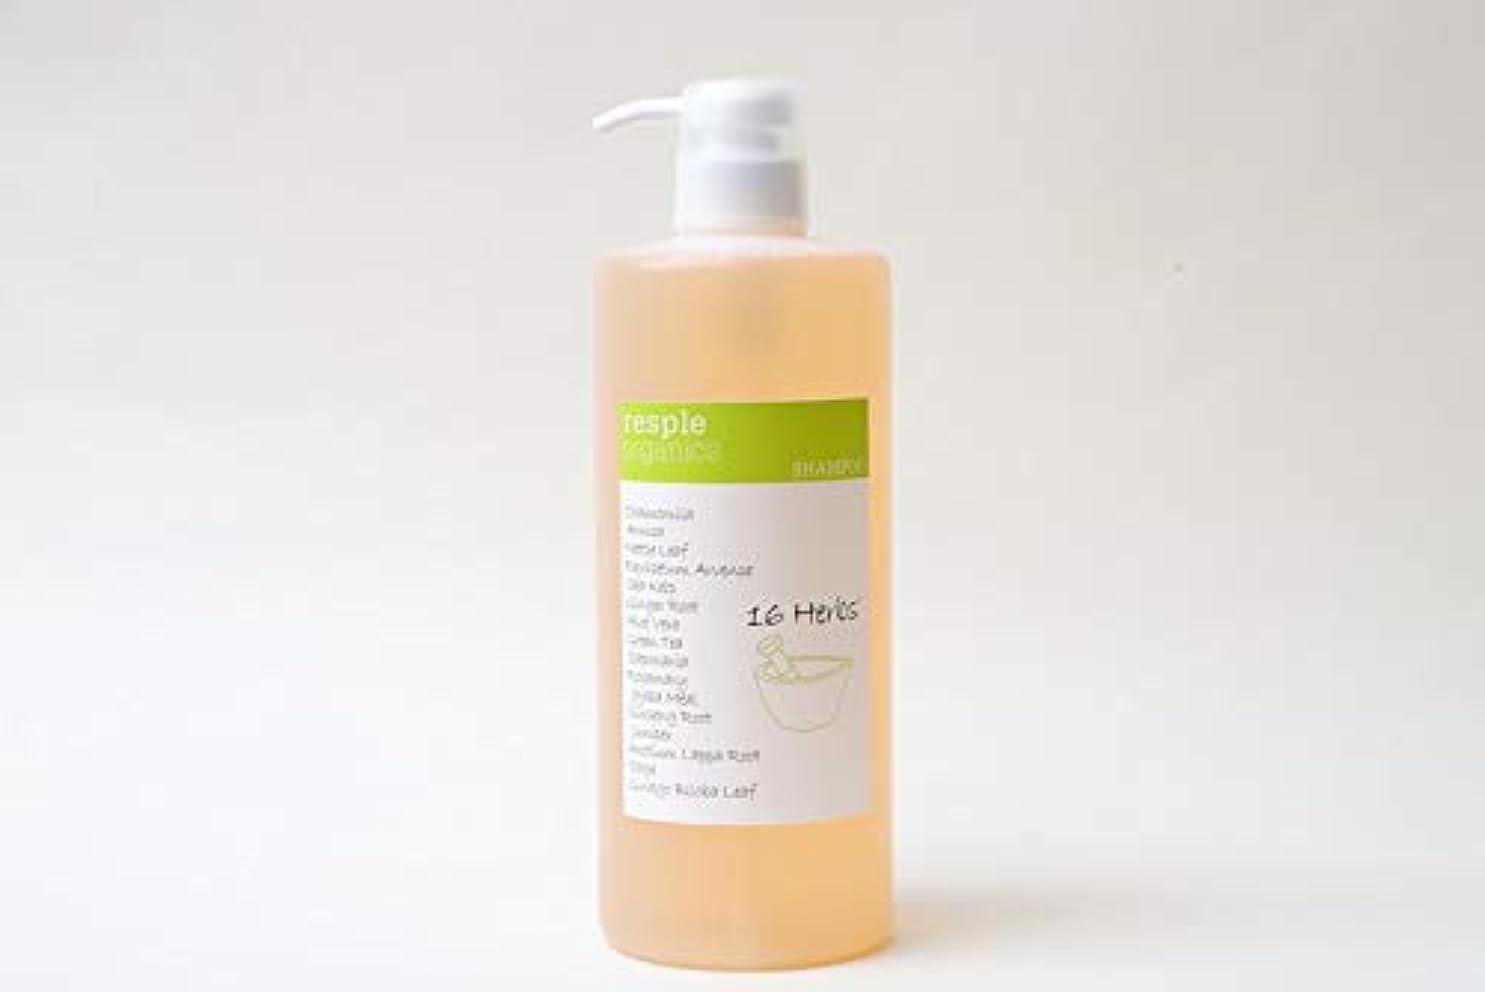 resple organics shampoo【1000ml】